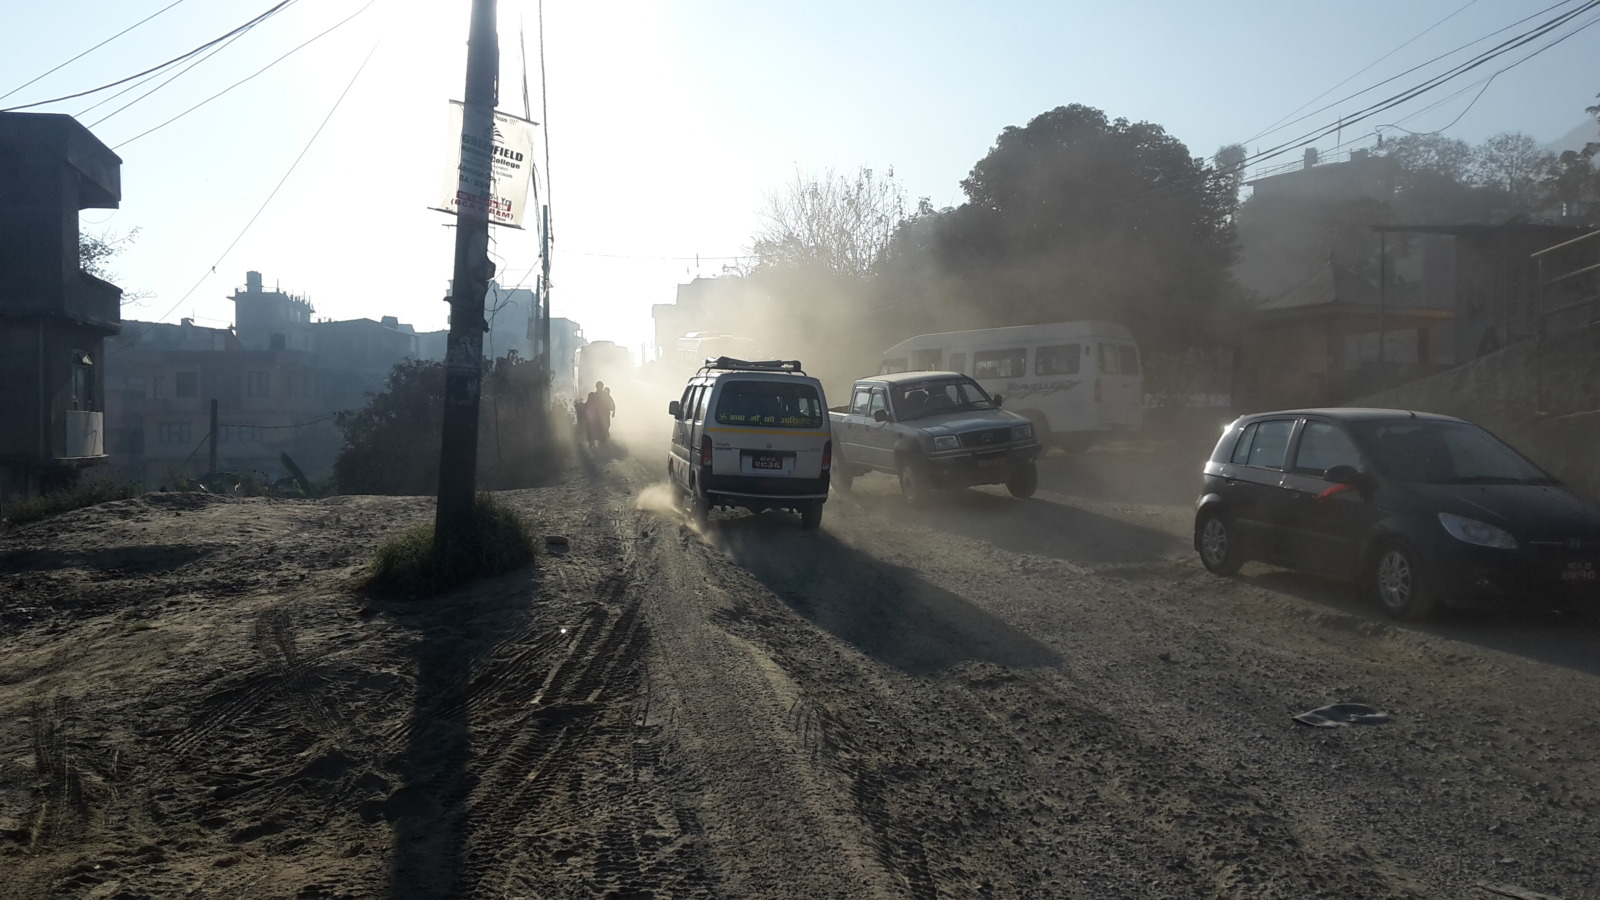 Main road into Kathmandu